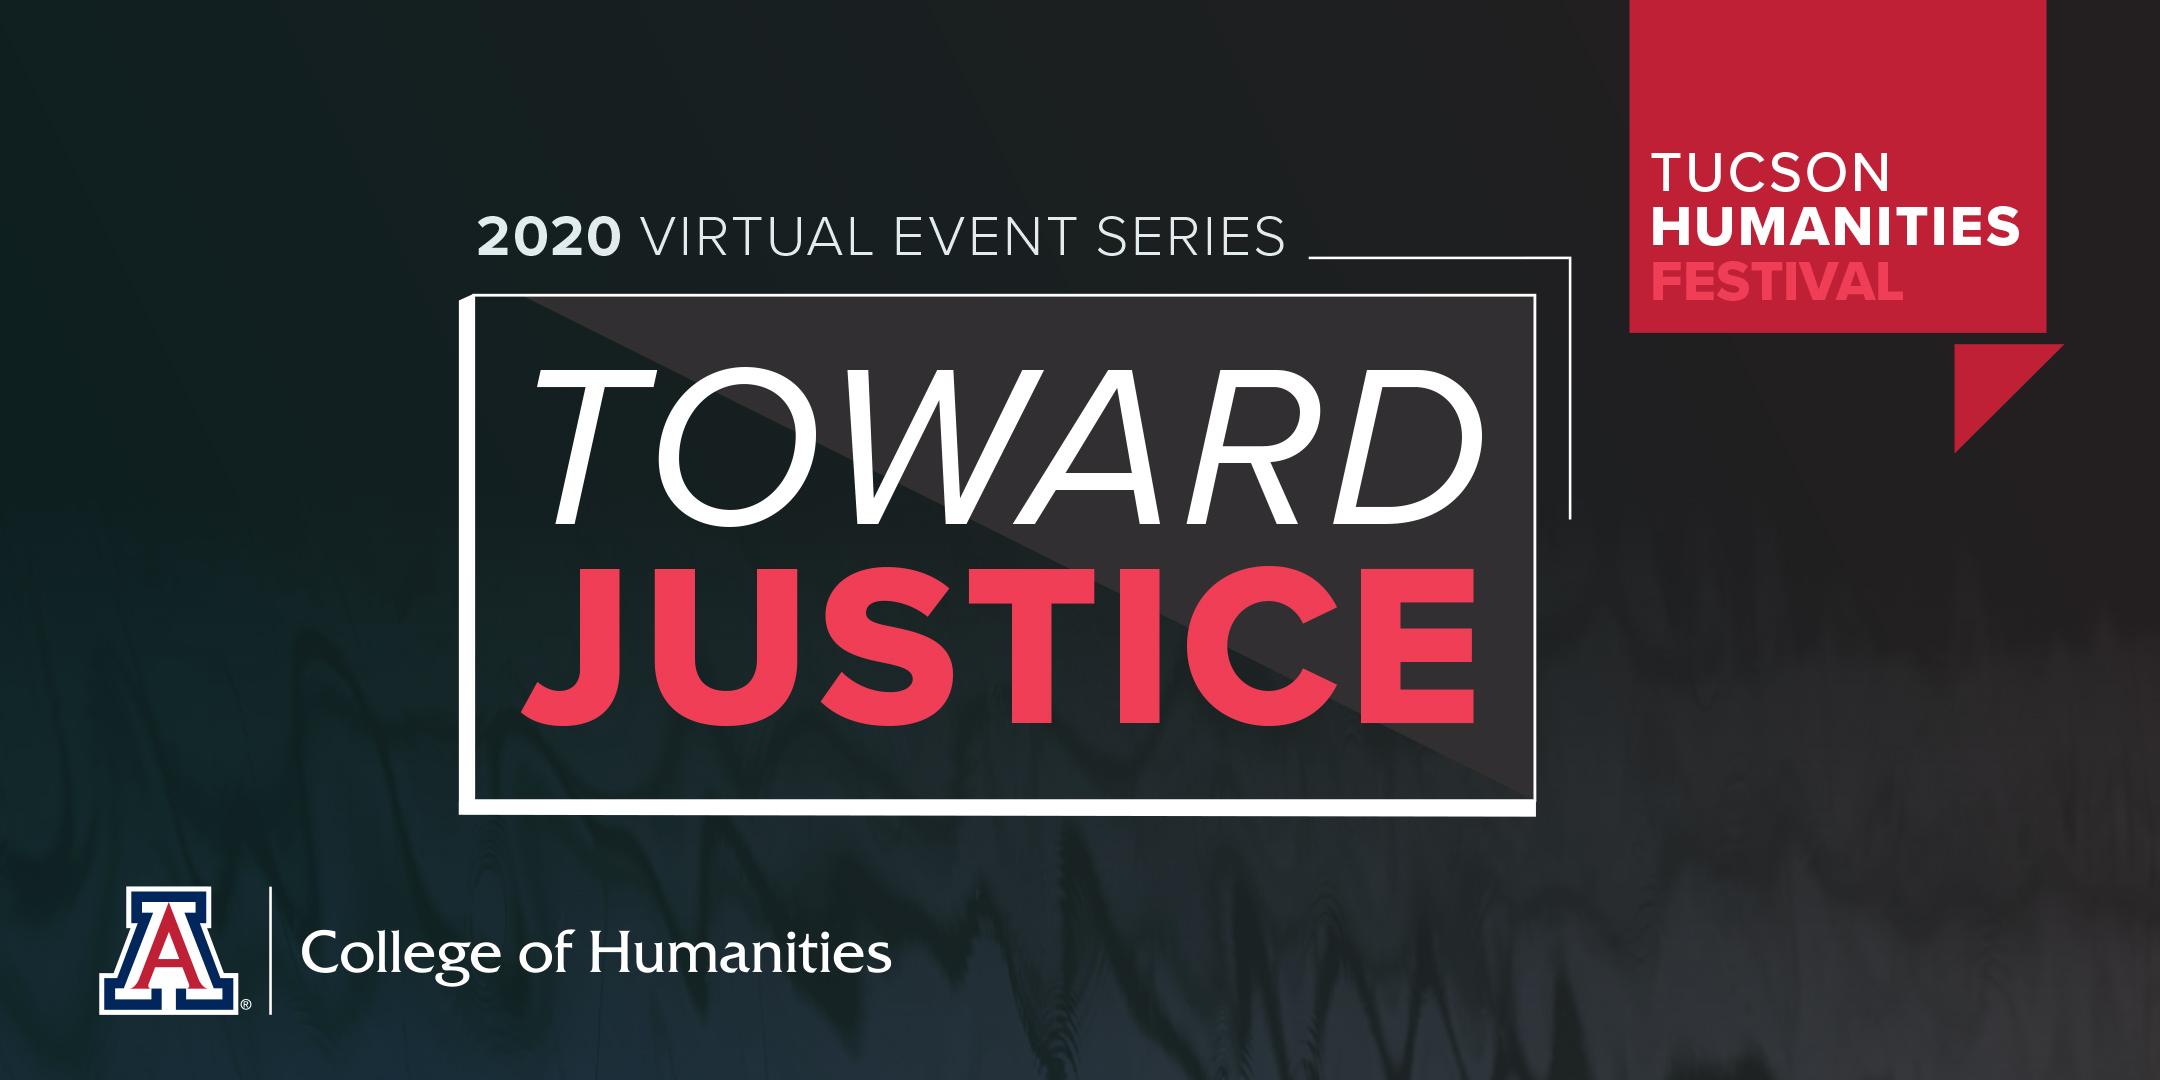 Tucson Humanities Festival Toward Justice logo